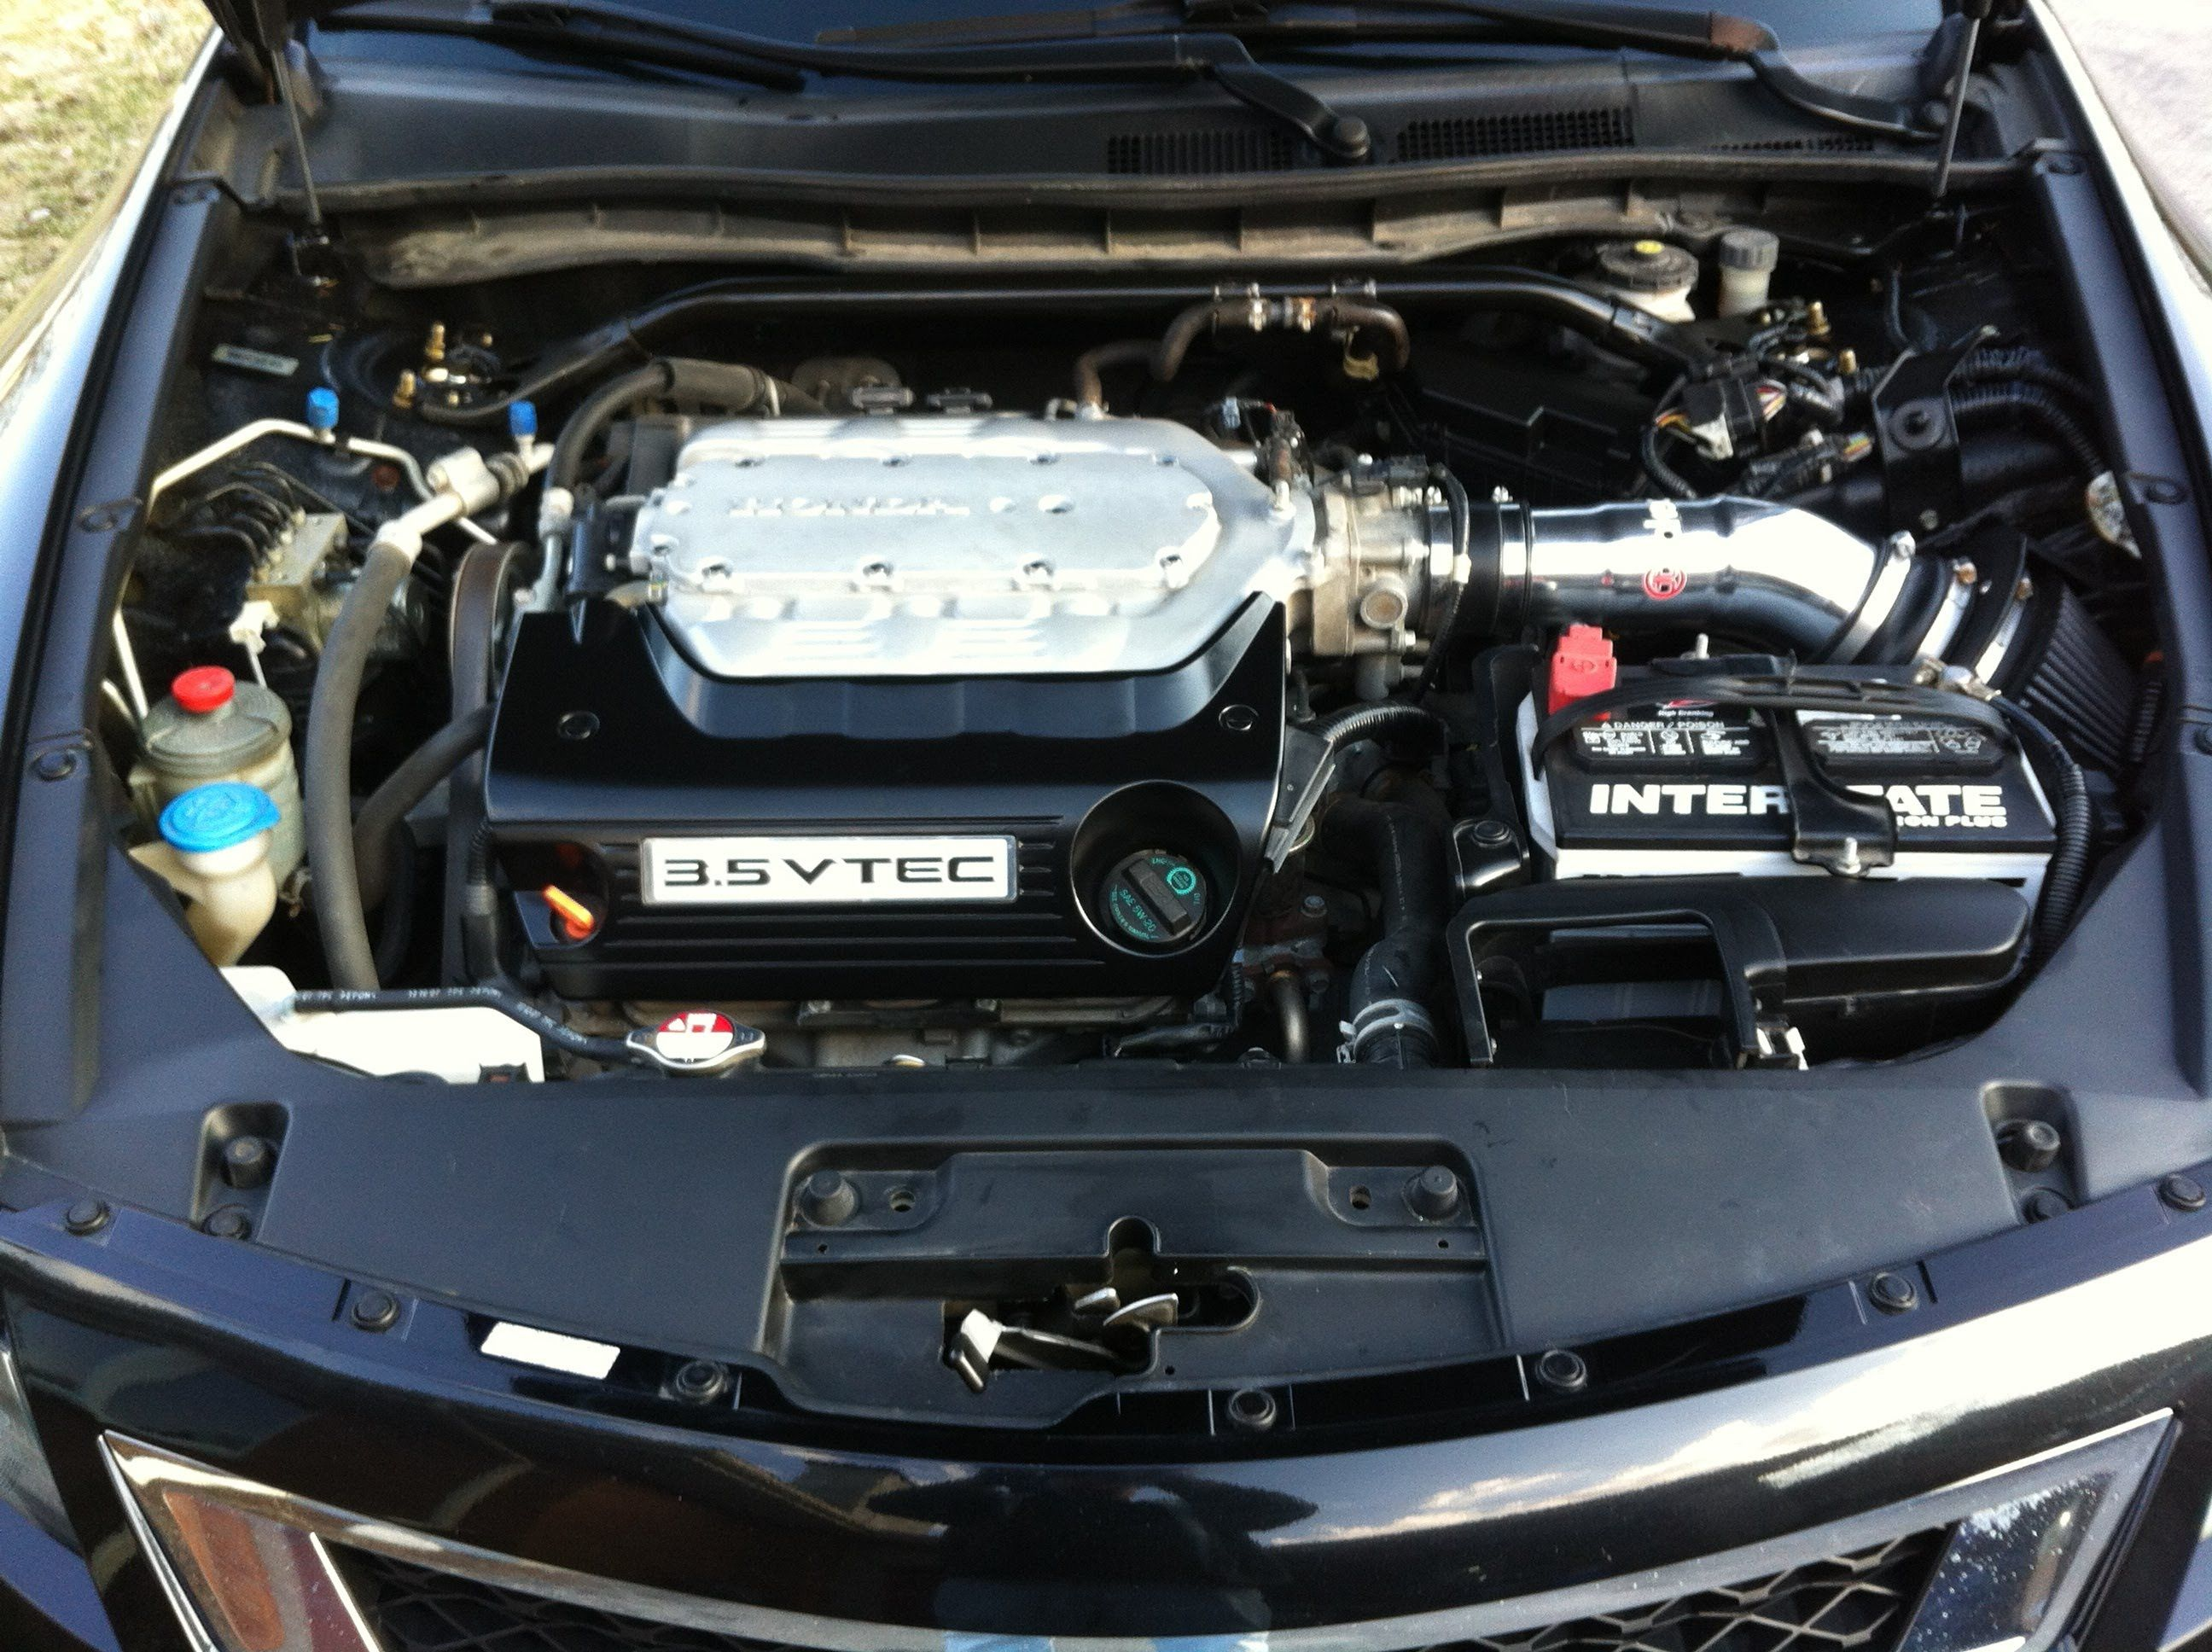 Honda Accord V6  Honda  Pinterest  Honda accord Honda accord